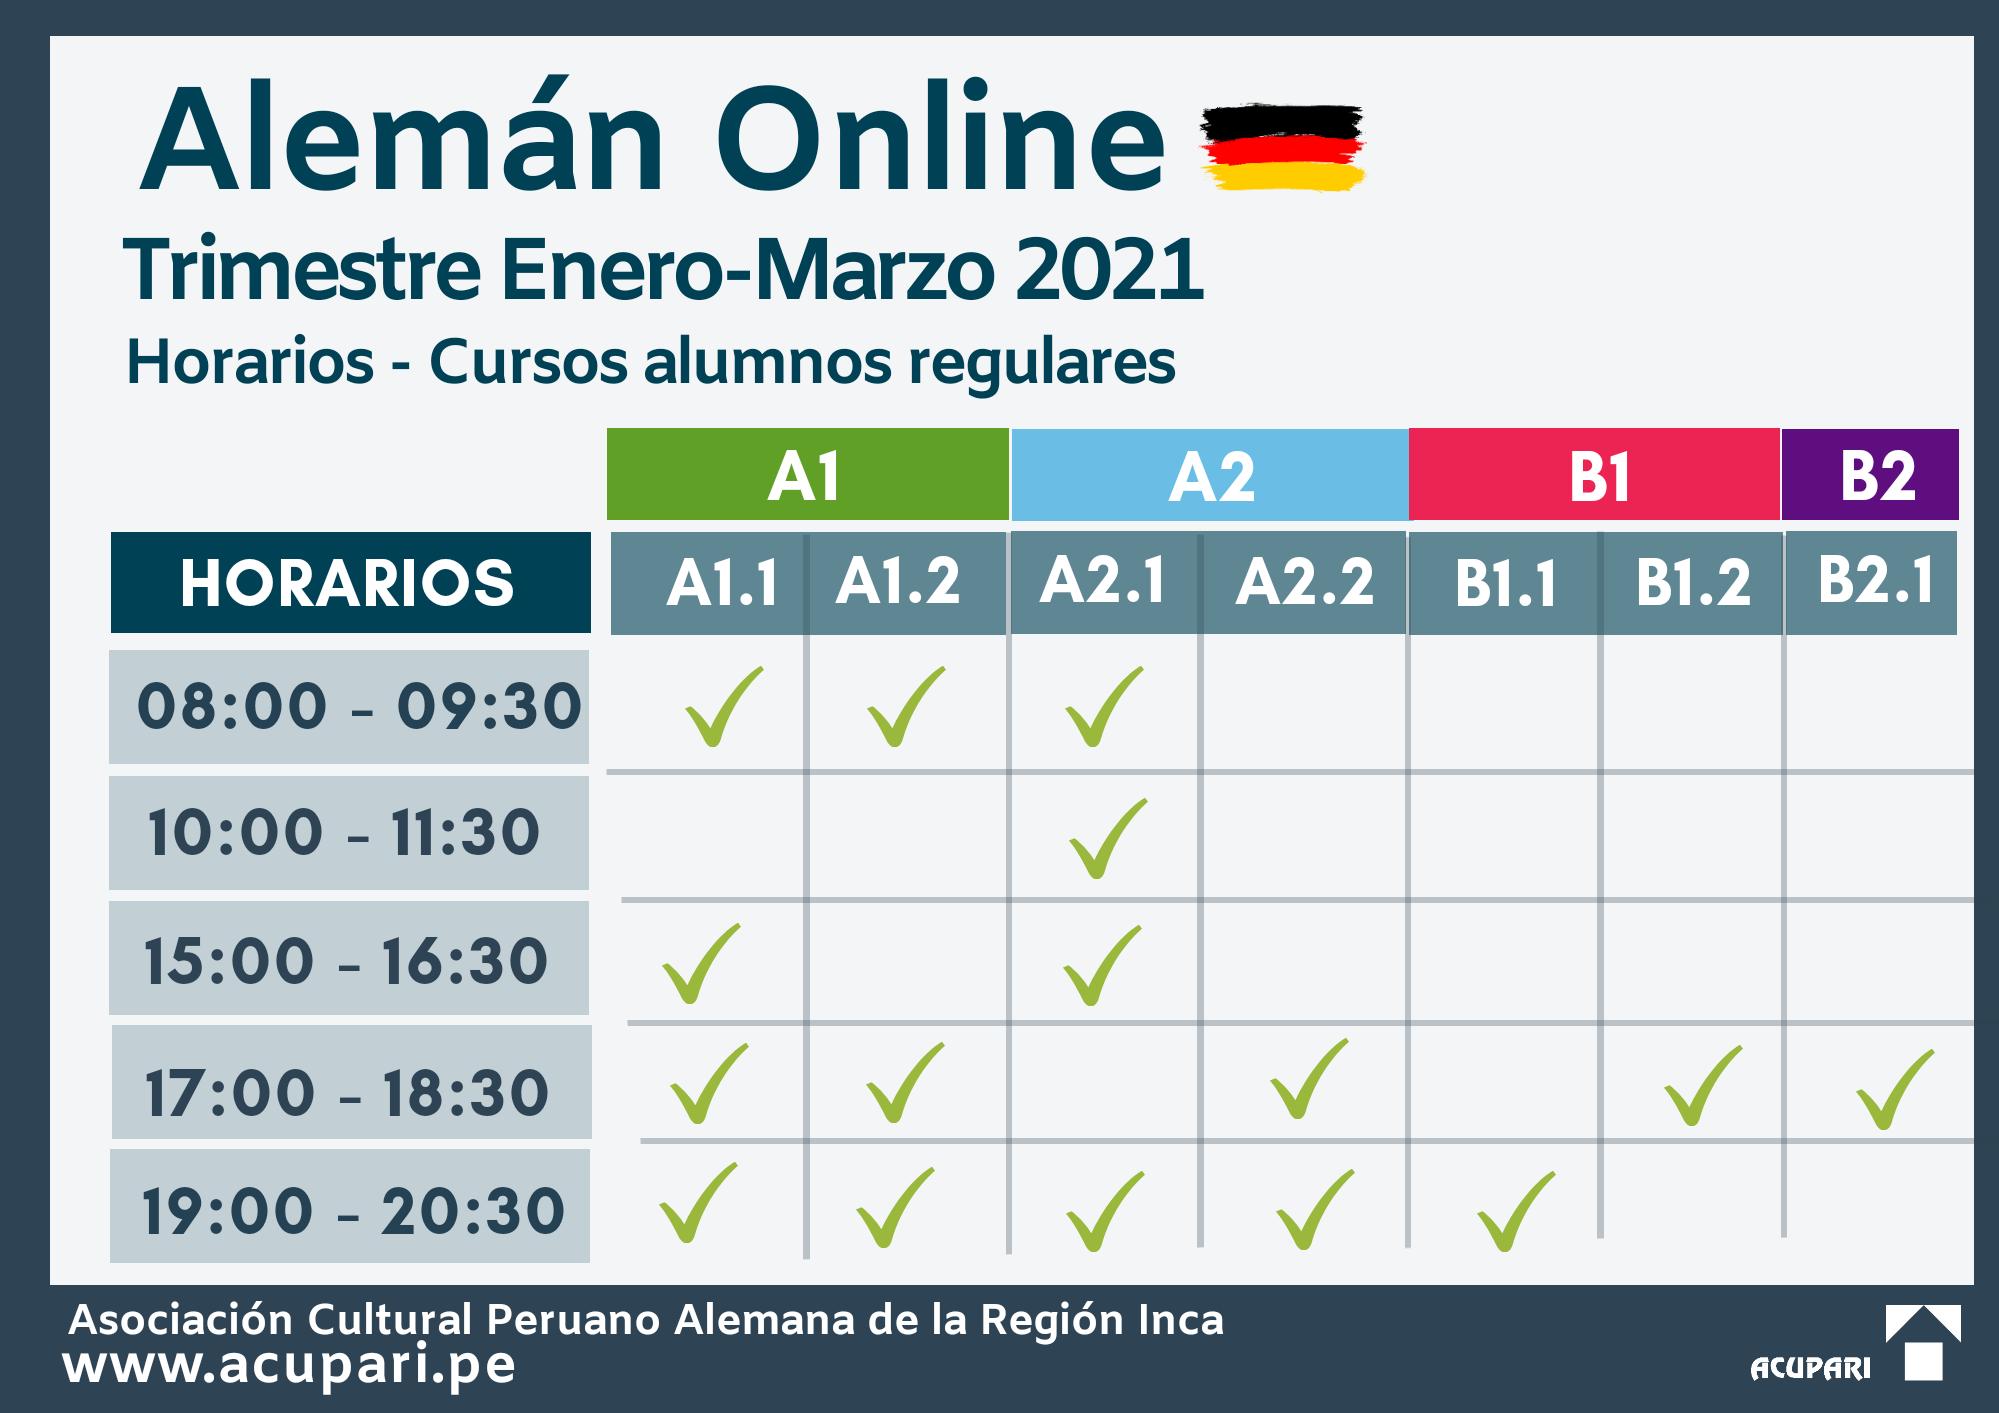 horario de almnos regulares de aleman